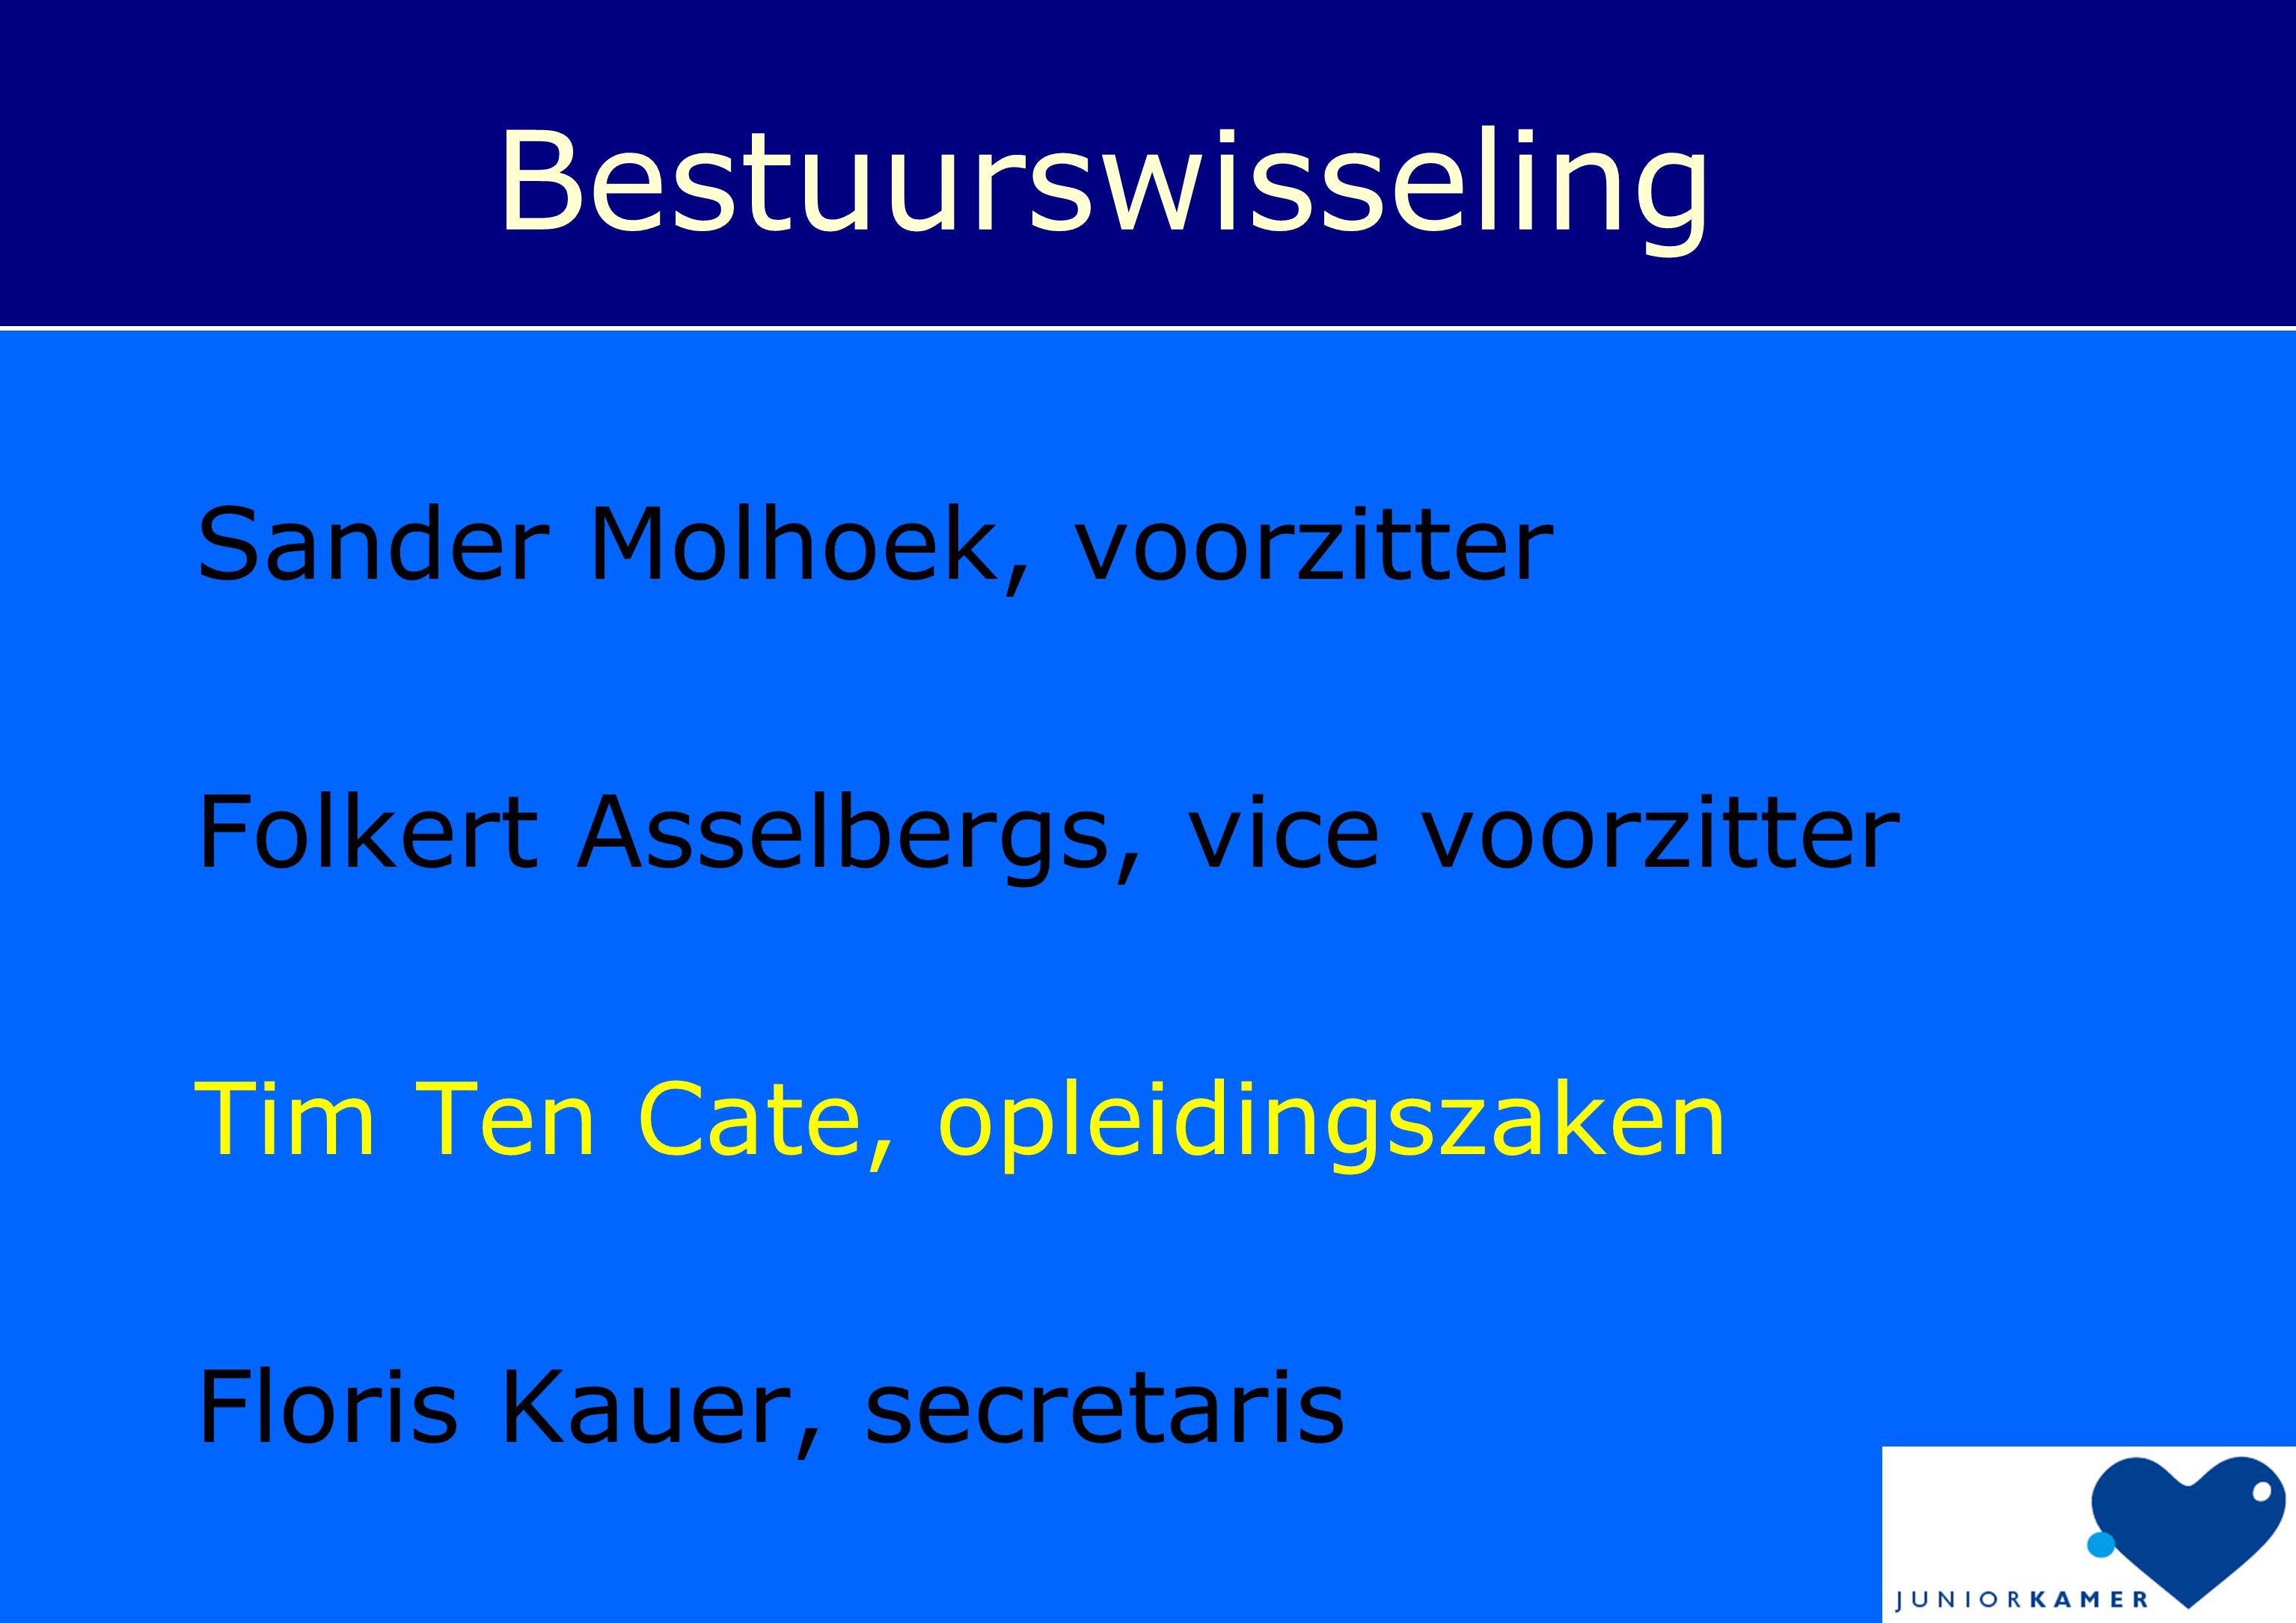 Sander Molhoek, voorzitter Folkert Asselbergs, vice voorzitter Tim Ten Cate, opleidingszaken Floris Kauer, secretaris